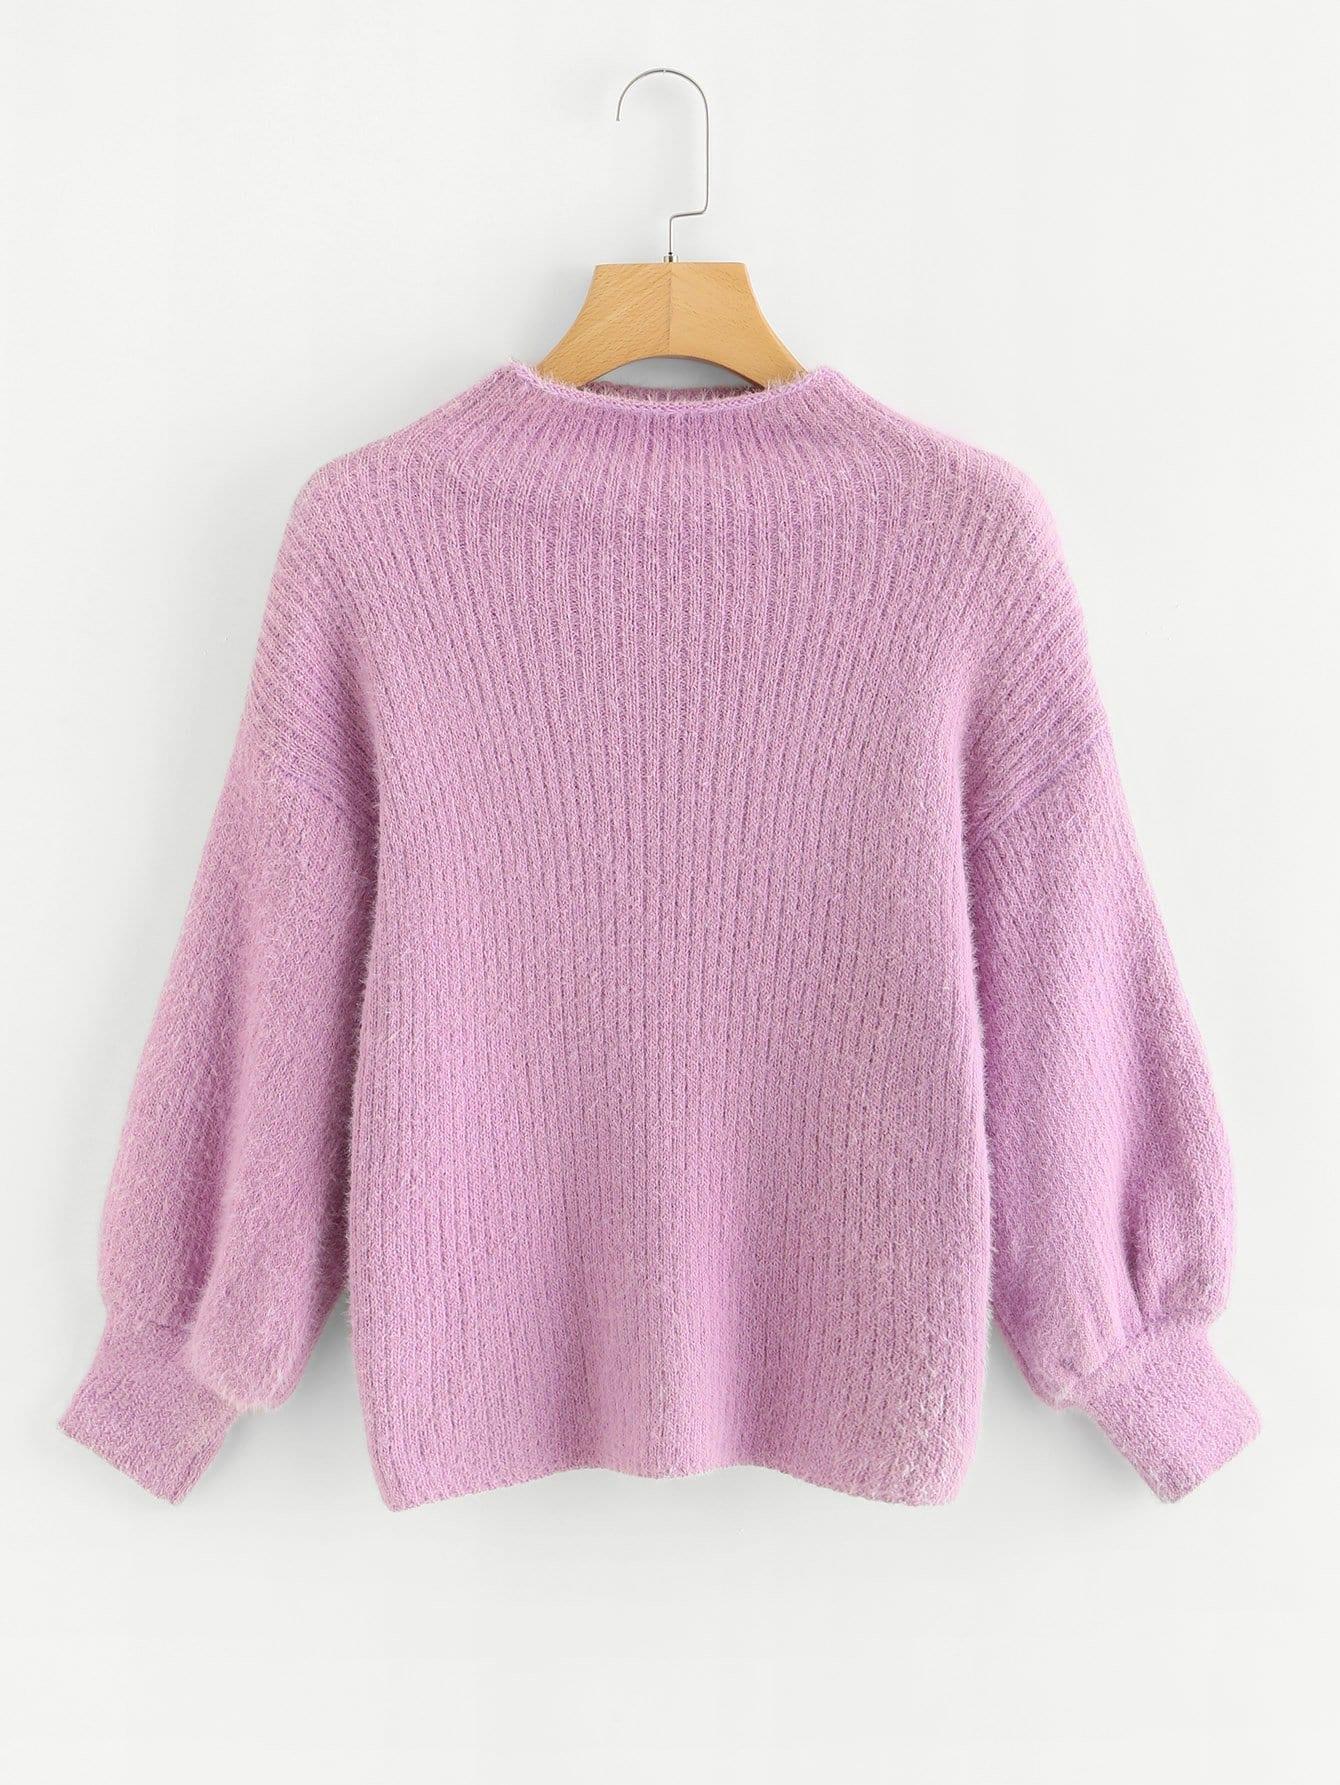 Купить Однотонный свитер с широкими рукавами, null, SheIn